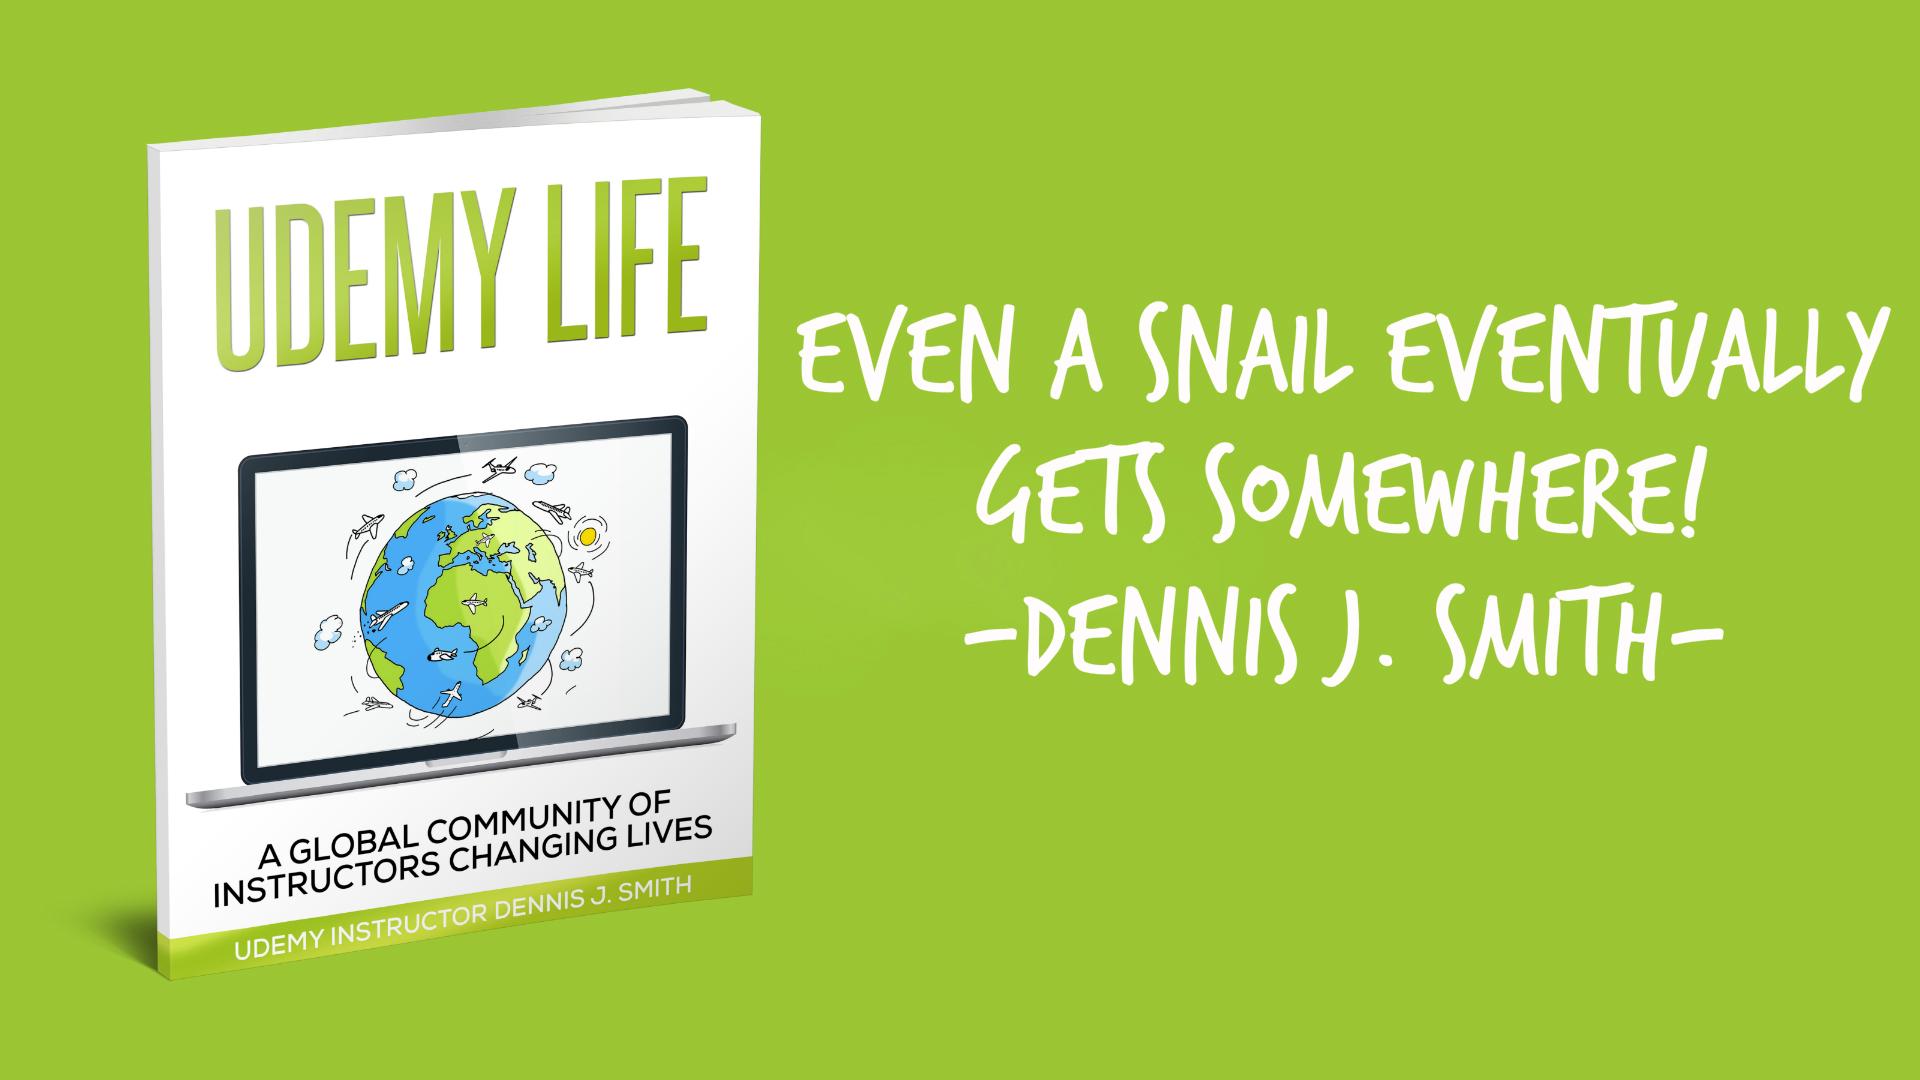 Even a snail eventually gets somewhere!